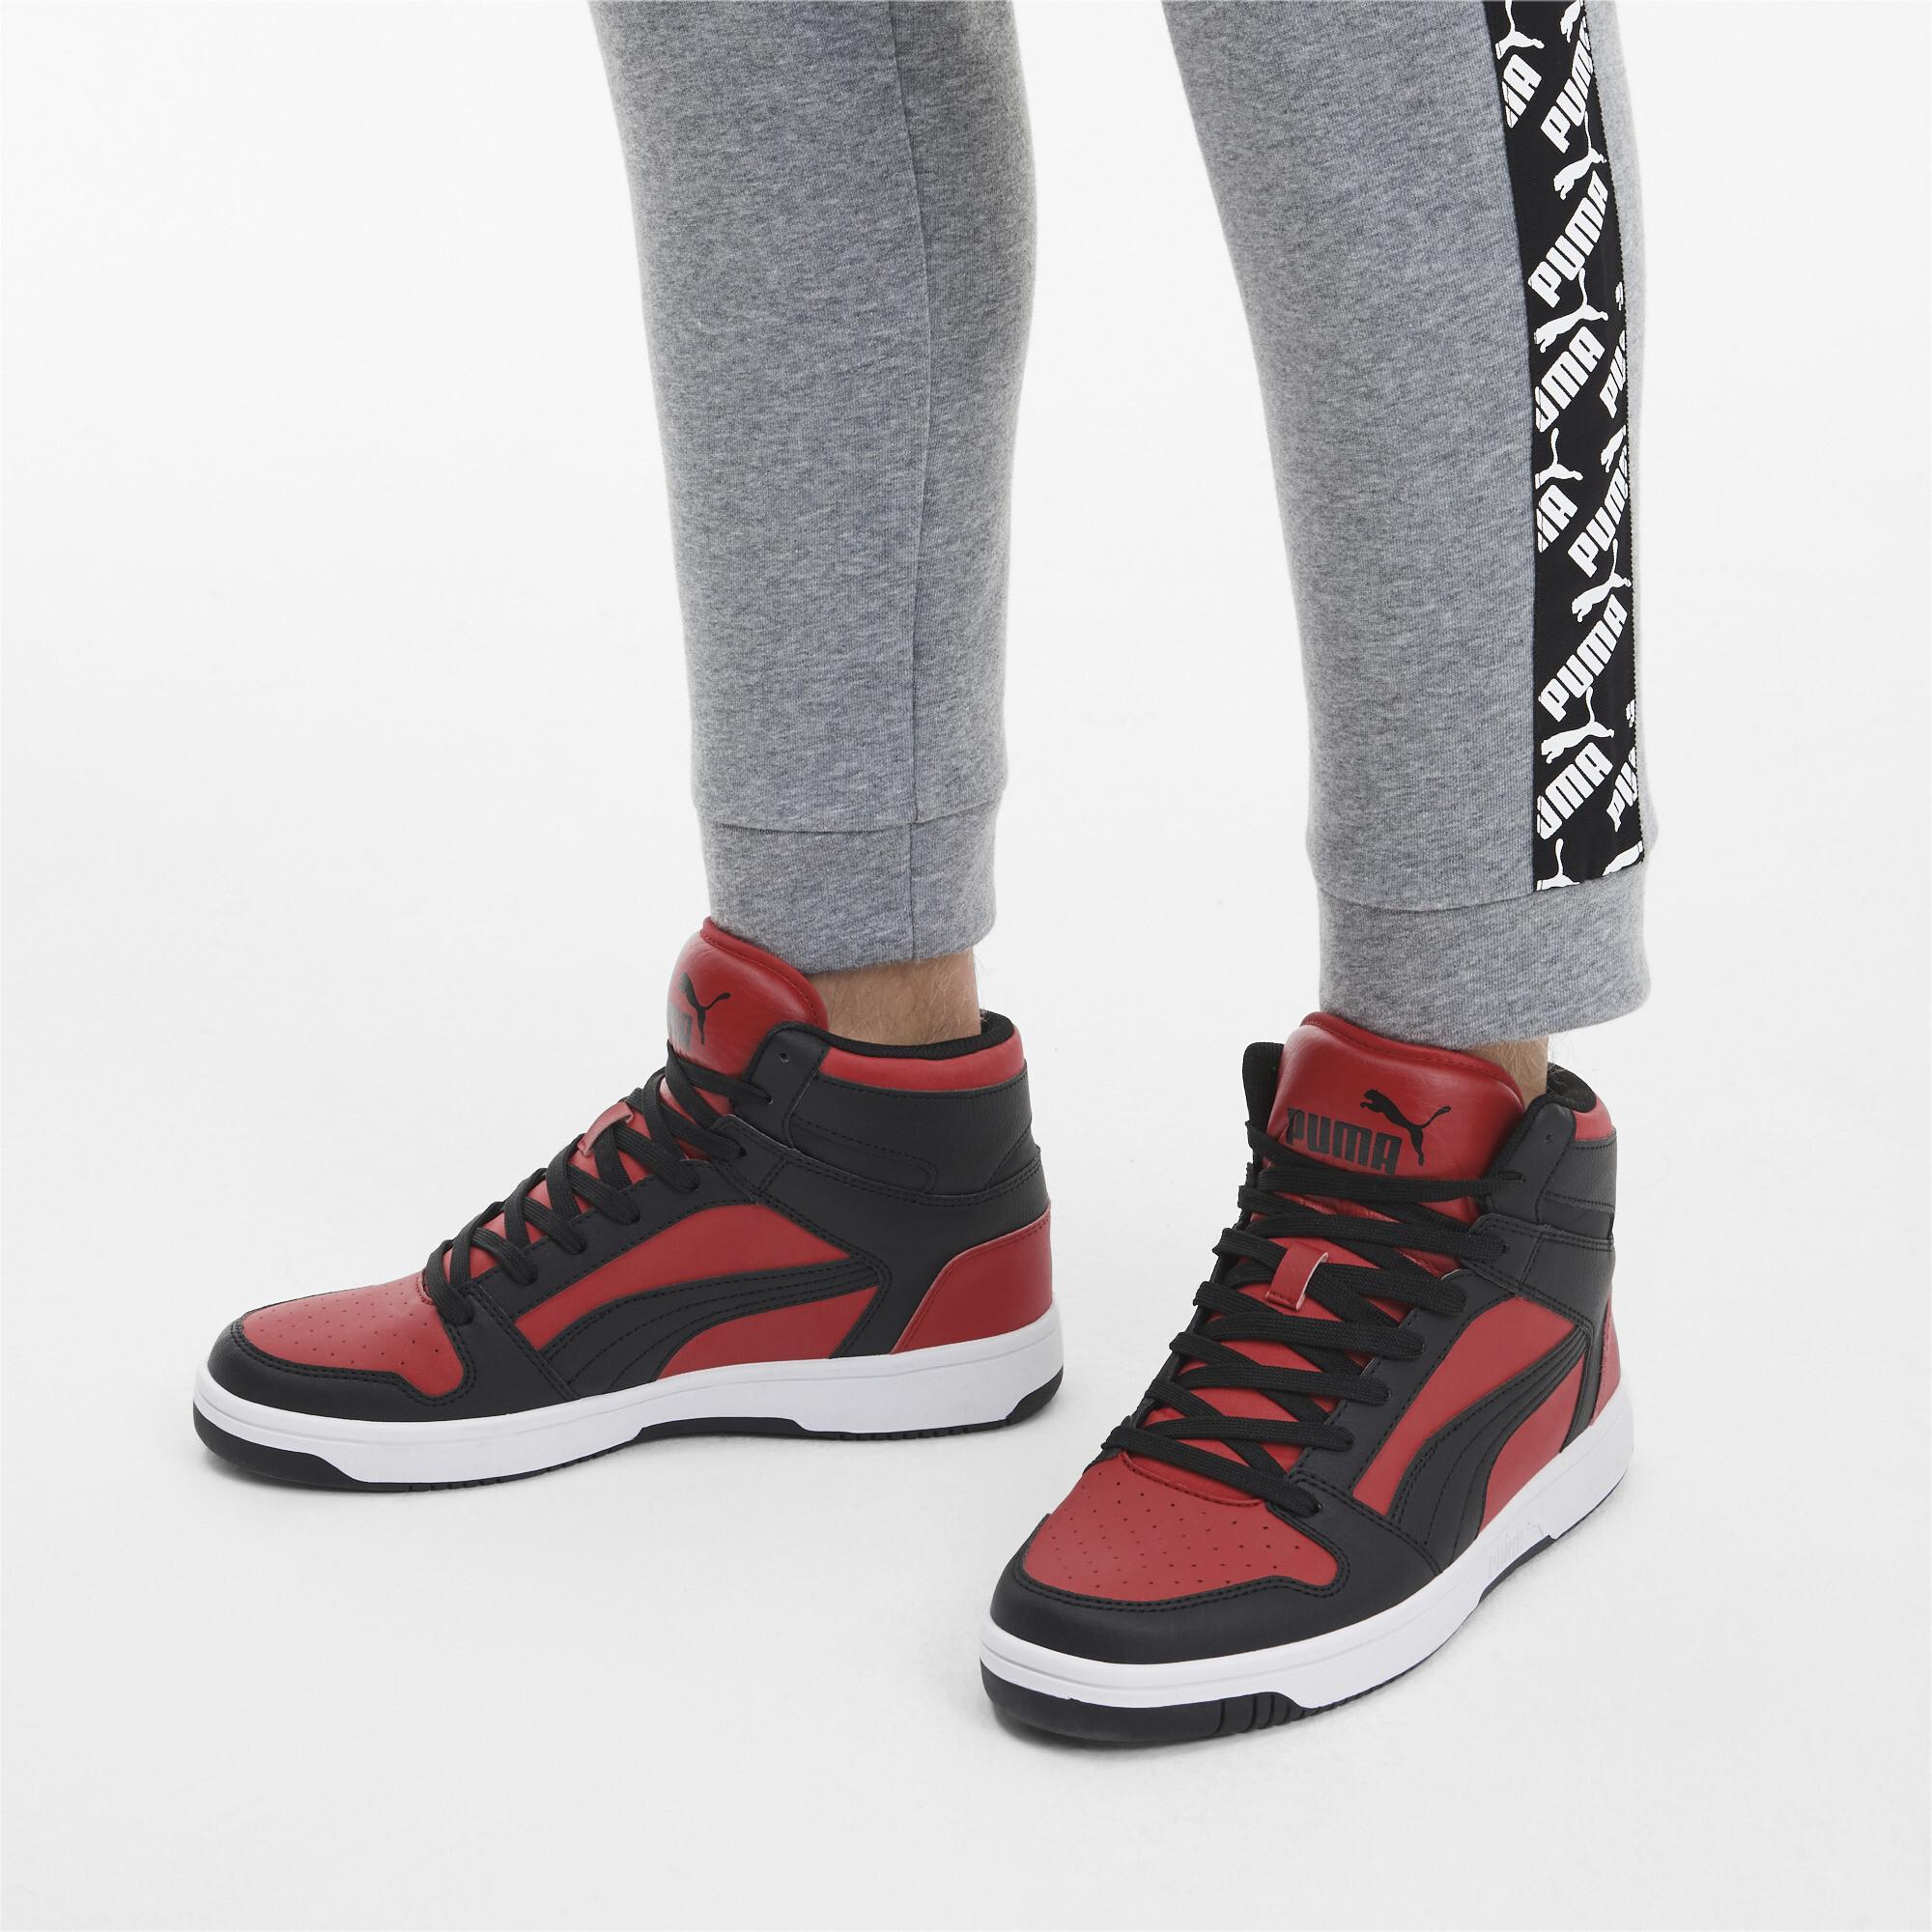 PUMA-PUMA-Rebound-LayUp-Men-039-s-Sneakers-Men-Mid-Boot-Basics thumbnail 23